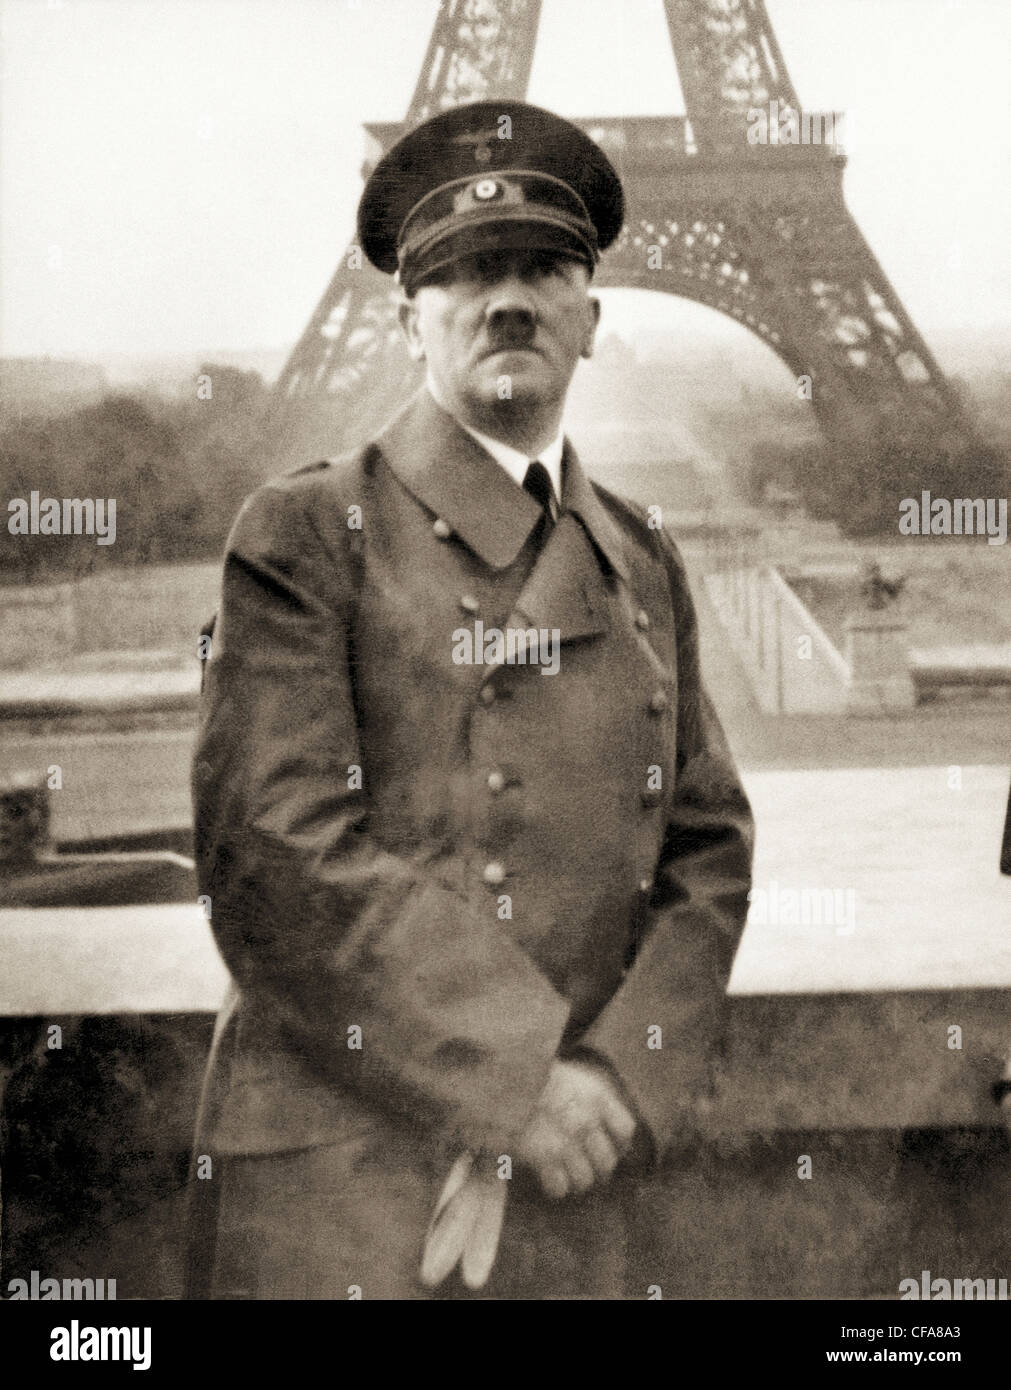 War, Europe, world war II, Nazi, National Socialist, Europe, world war, 1940, Paris, Hitler, Adolf Hitler, leader, - Stock Image